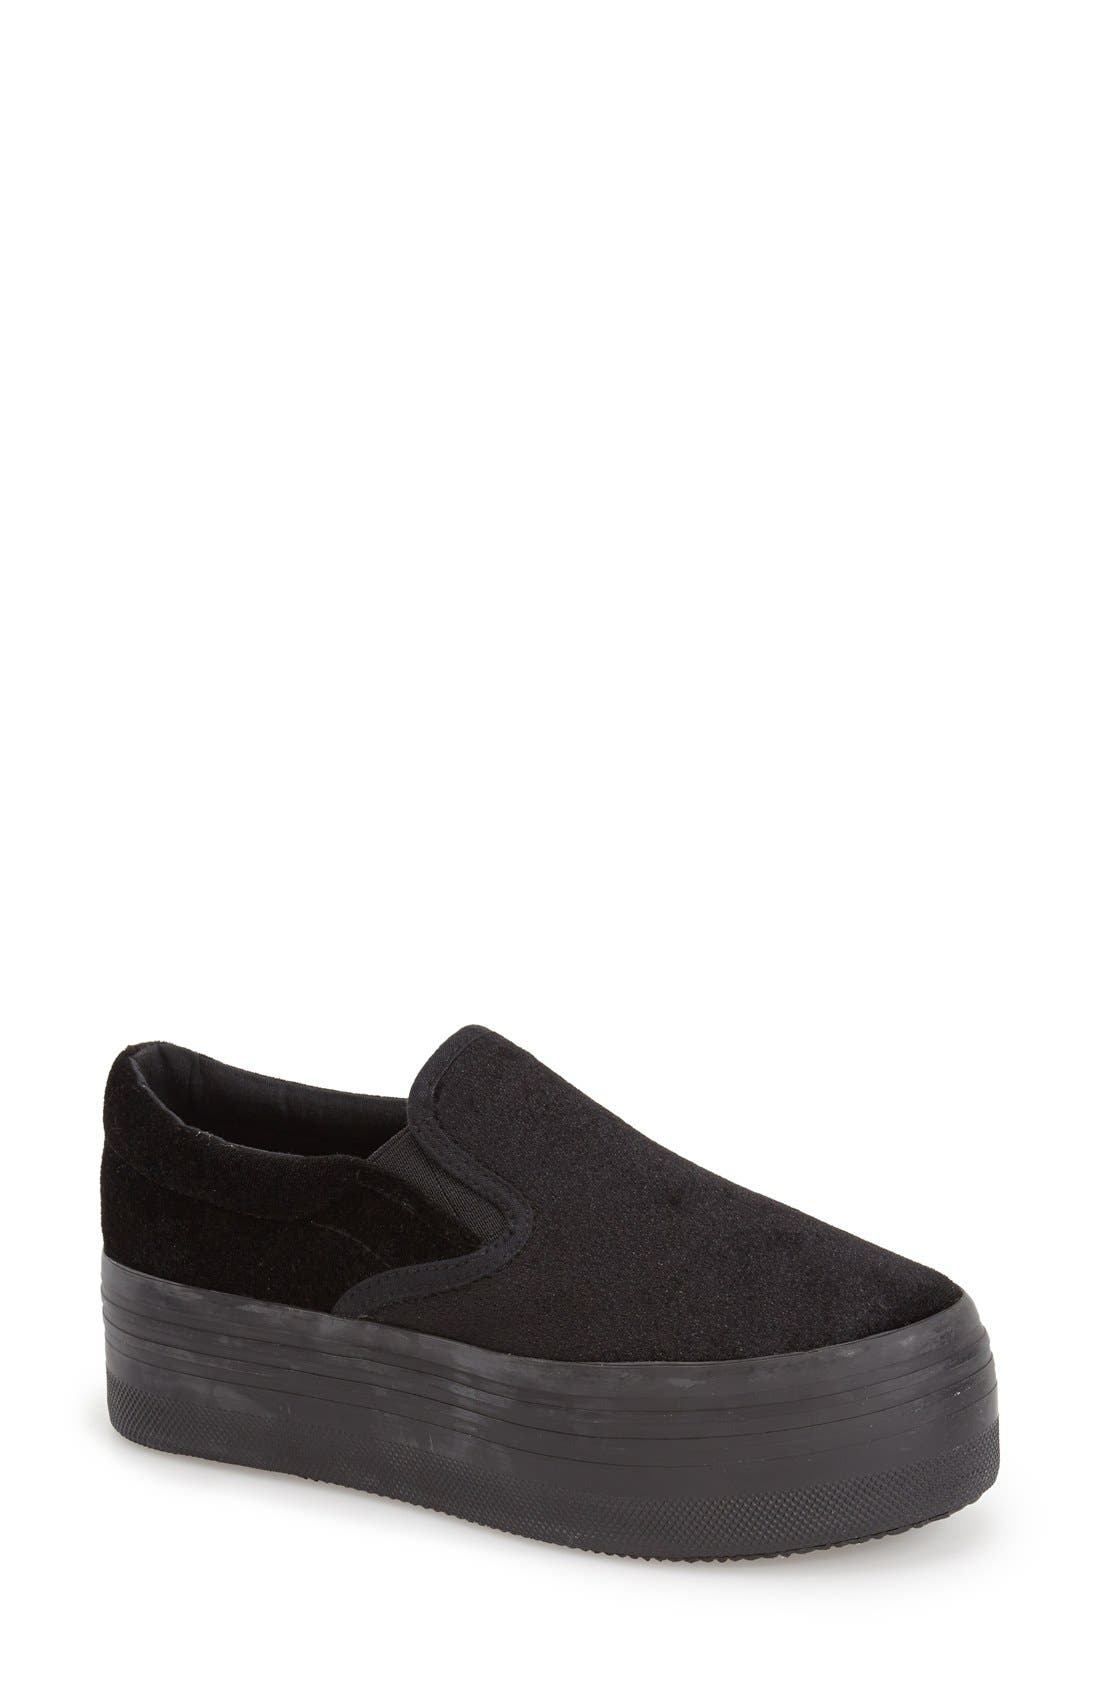 Alternate Image 1 Selected - Jeffrey Campbell 'See-Ya' Slip-On Platform Sneaker (Women)